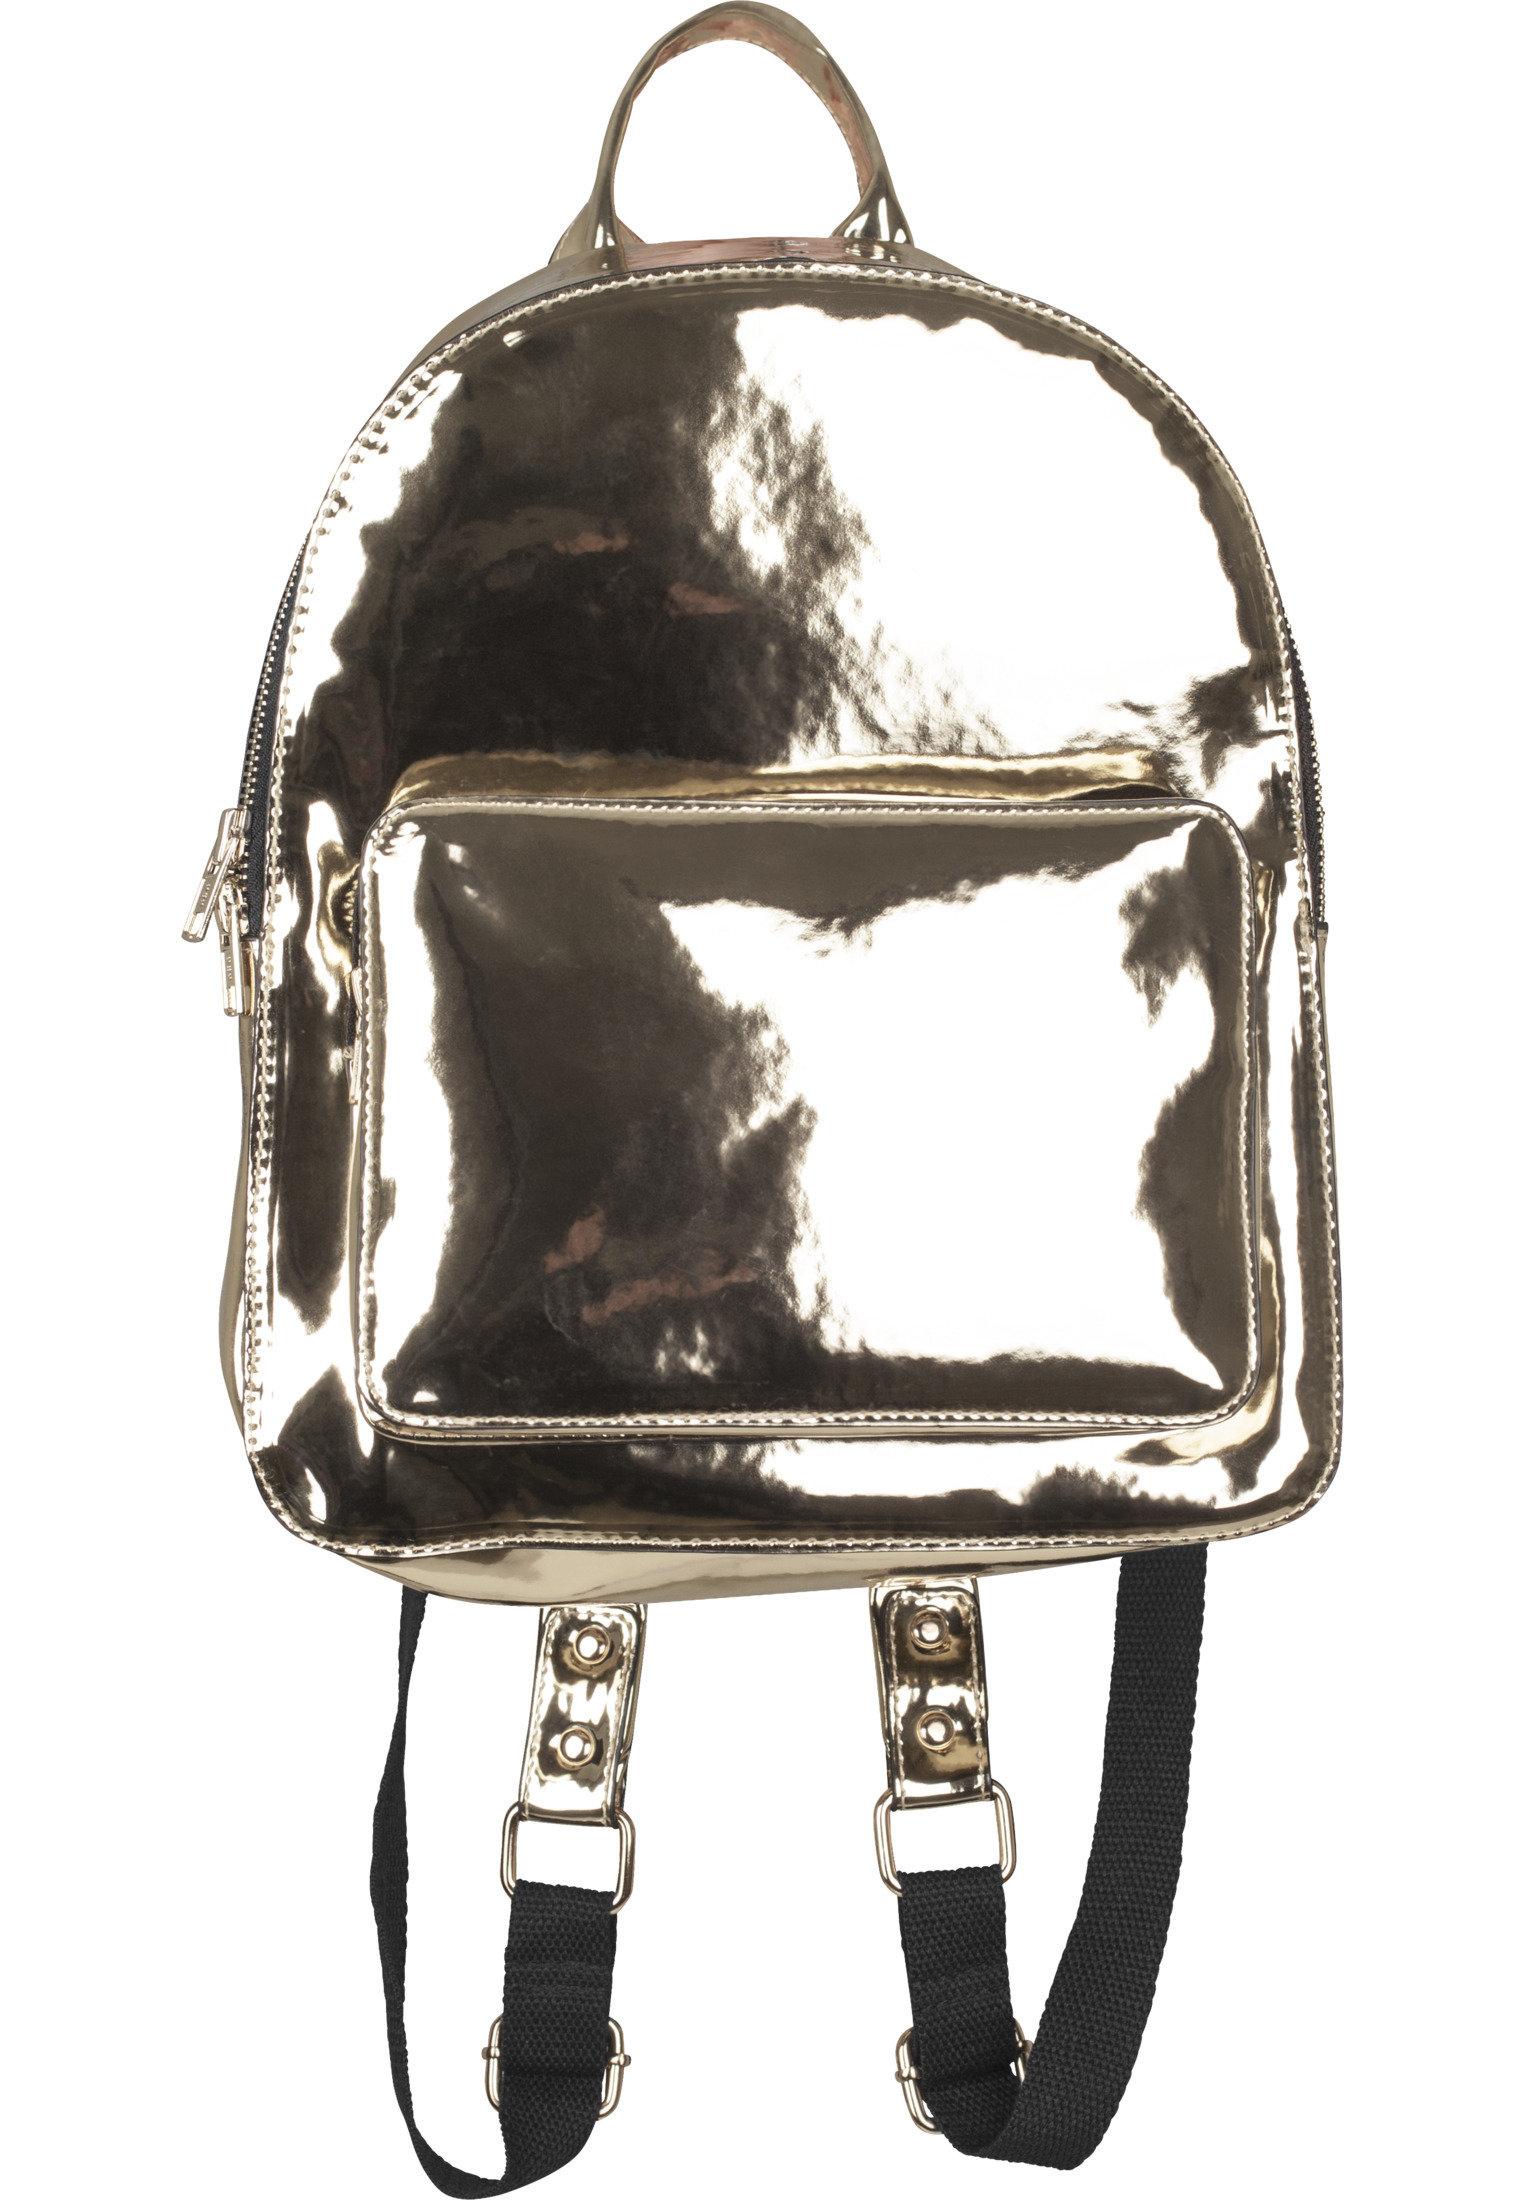 Sac à dos gold metallic URBAN CLASSICS urban classics-sac a dos midi gold